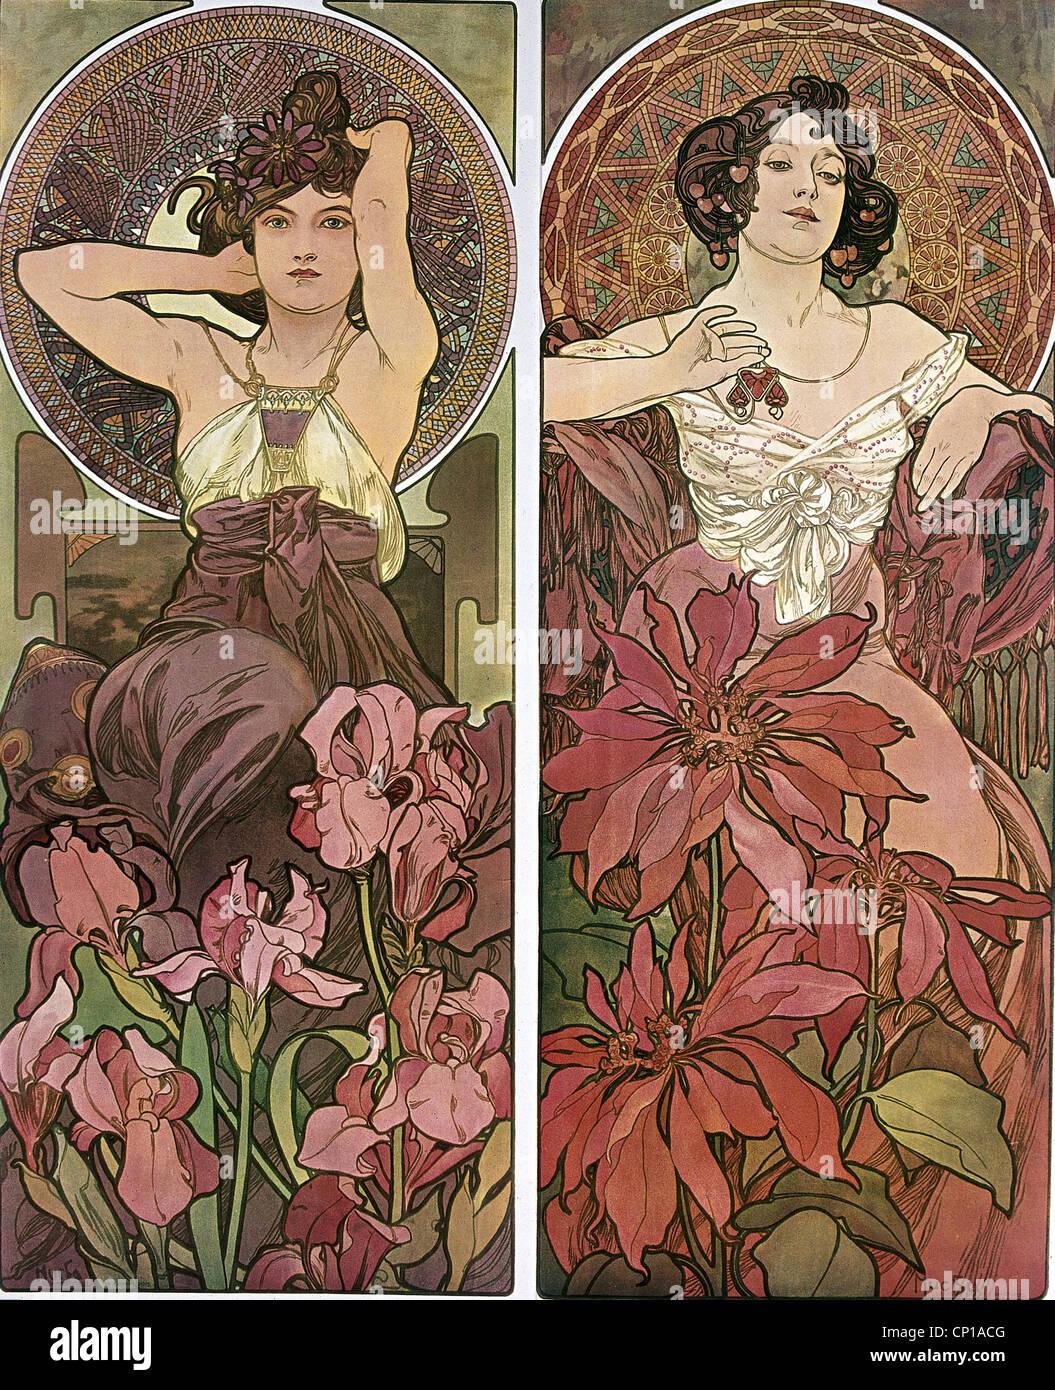 fine arts, Mucha, Alfons (1860 - 1939), poster, circa 1900, two women, sitting, flowers, hair, Art Nouveau, Alphonse, Stock Photo